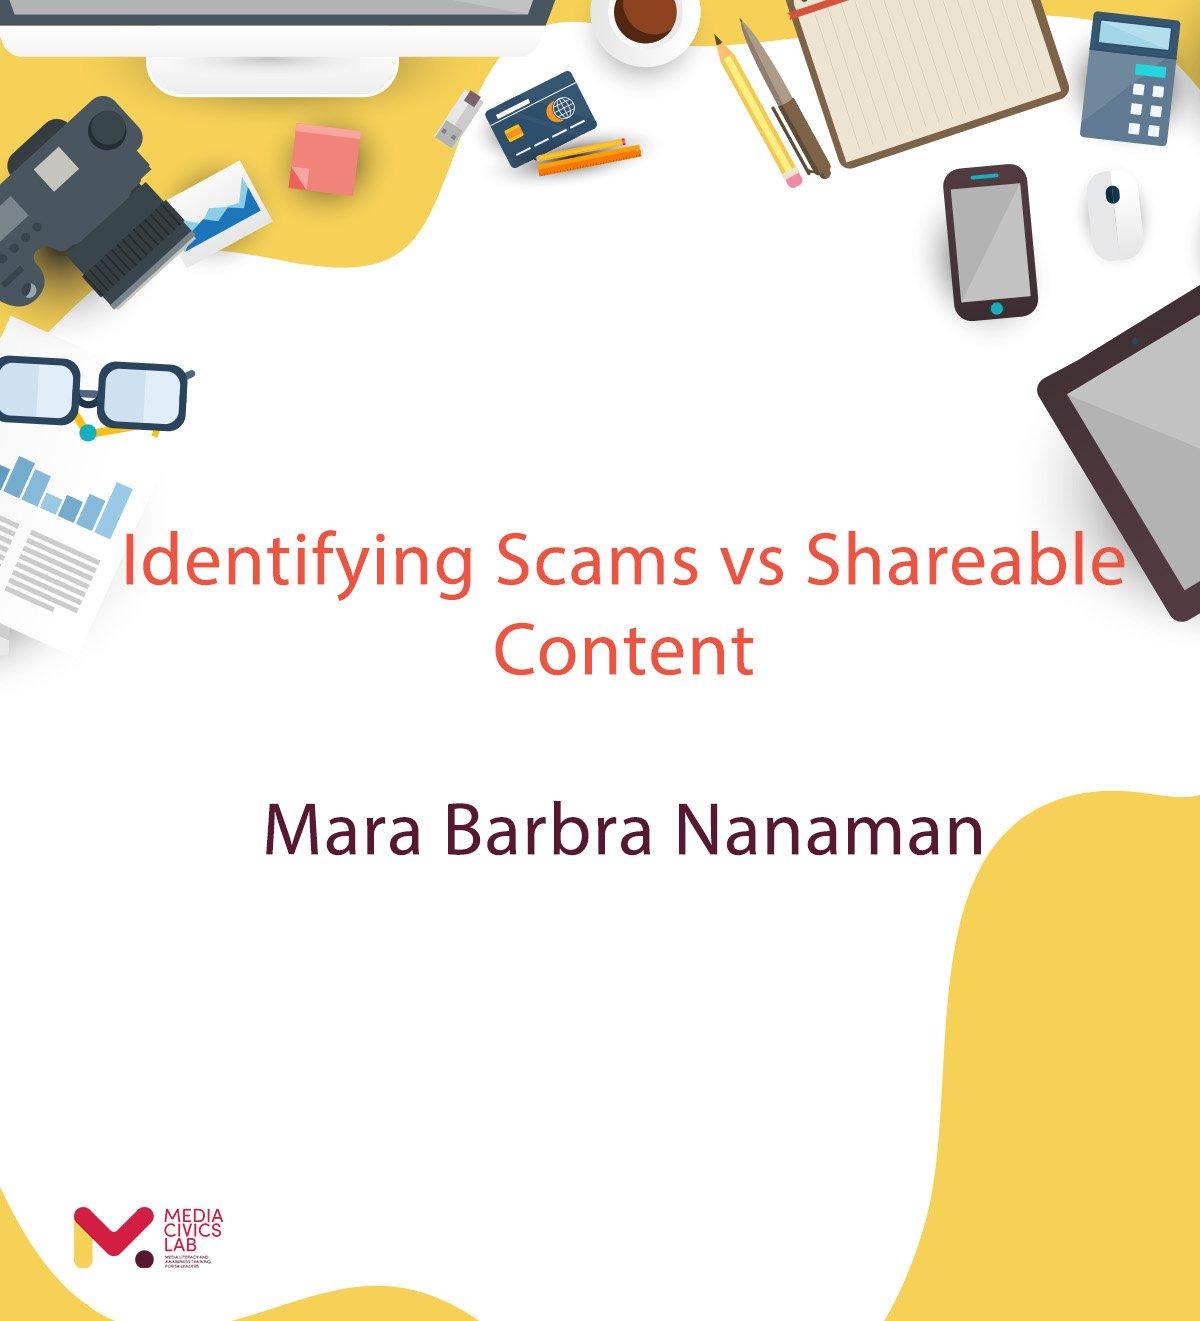 Identifying Scams vs Shareable Content – Mara Barbra Nanaman